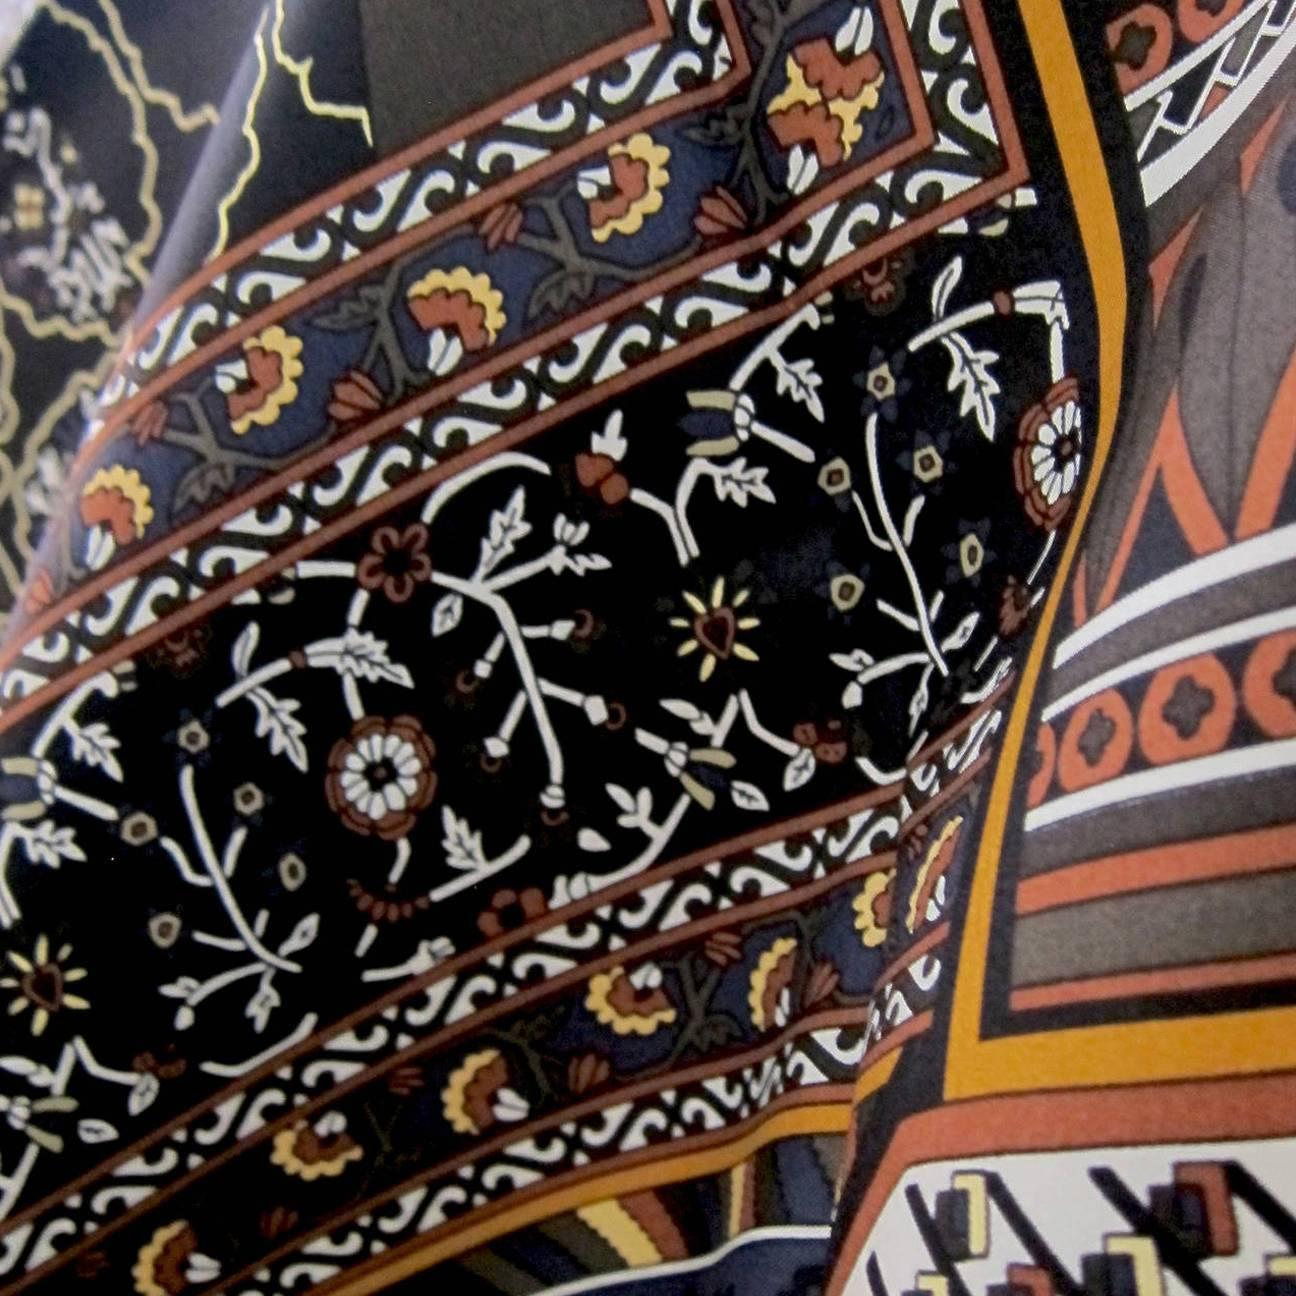 hermes tapis persans giant silk gm neutral shawl scarf 140cm grail at 1stdibs. Black Bedroom Furniture Sets. Home Design Ideas